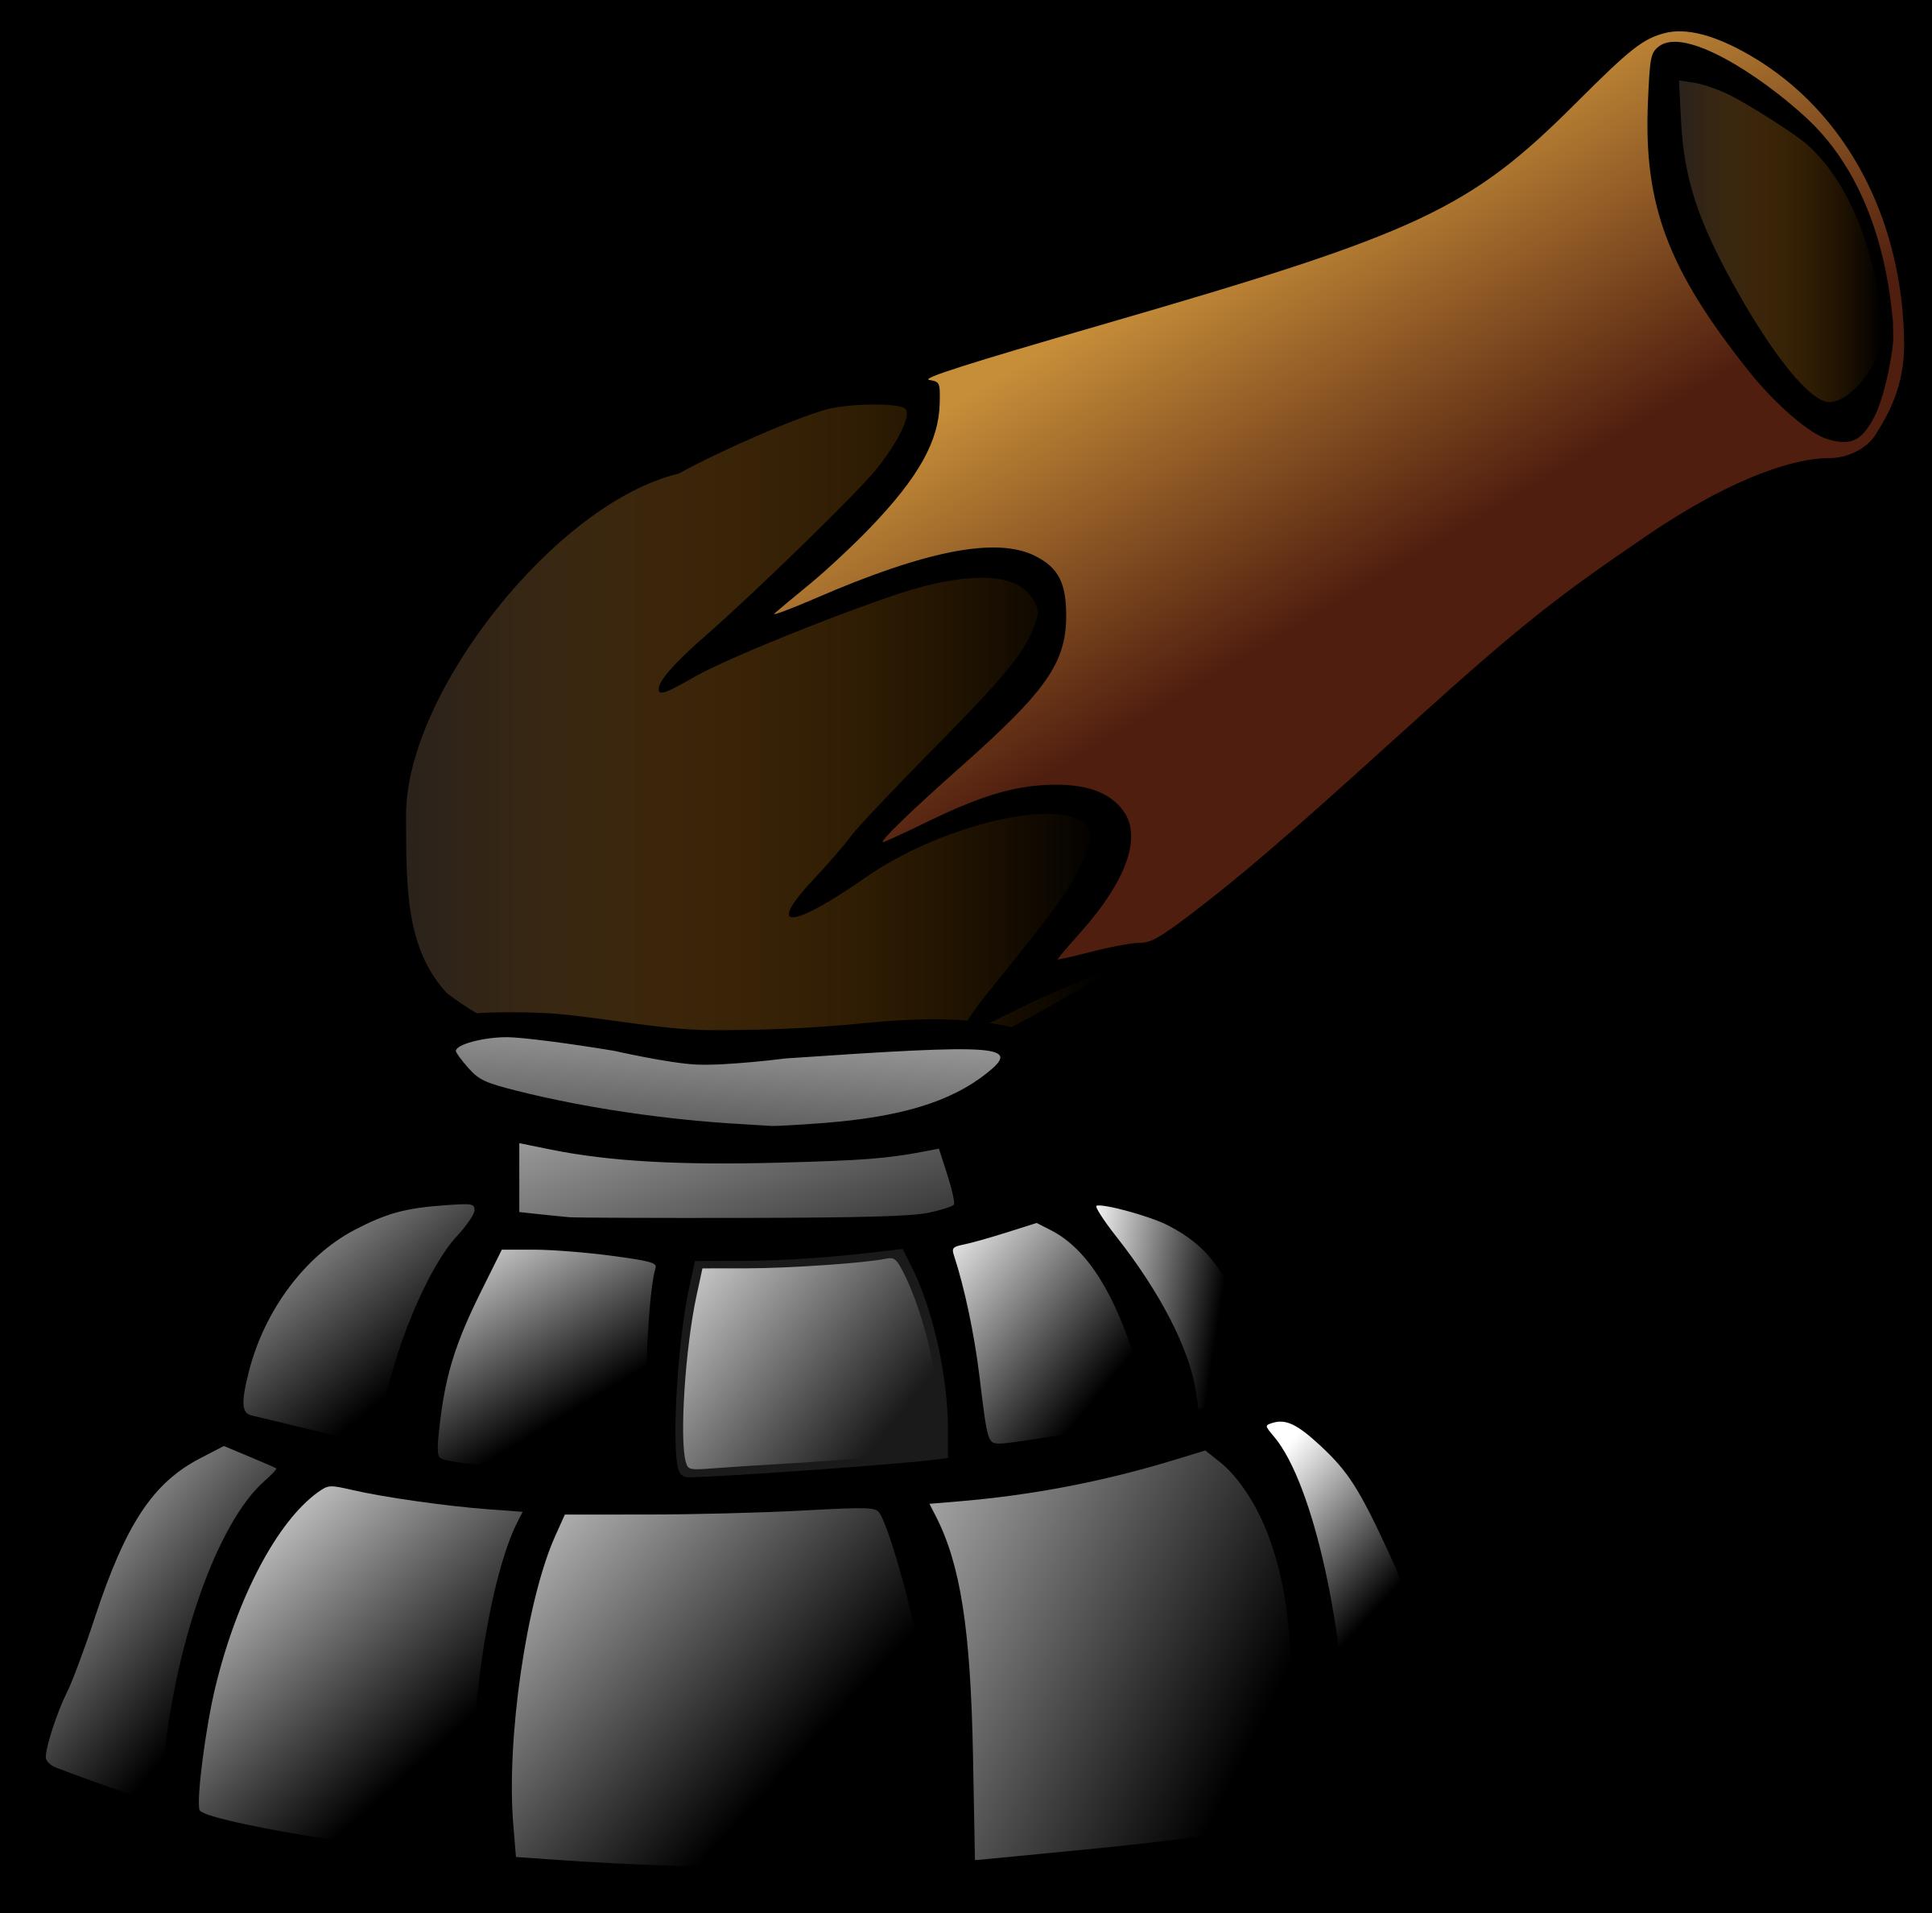 Cannon Clipart